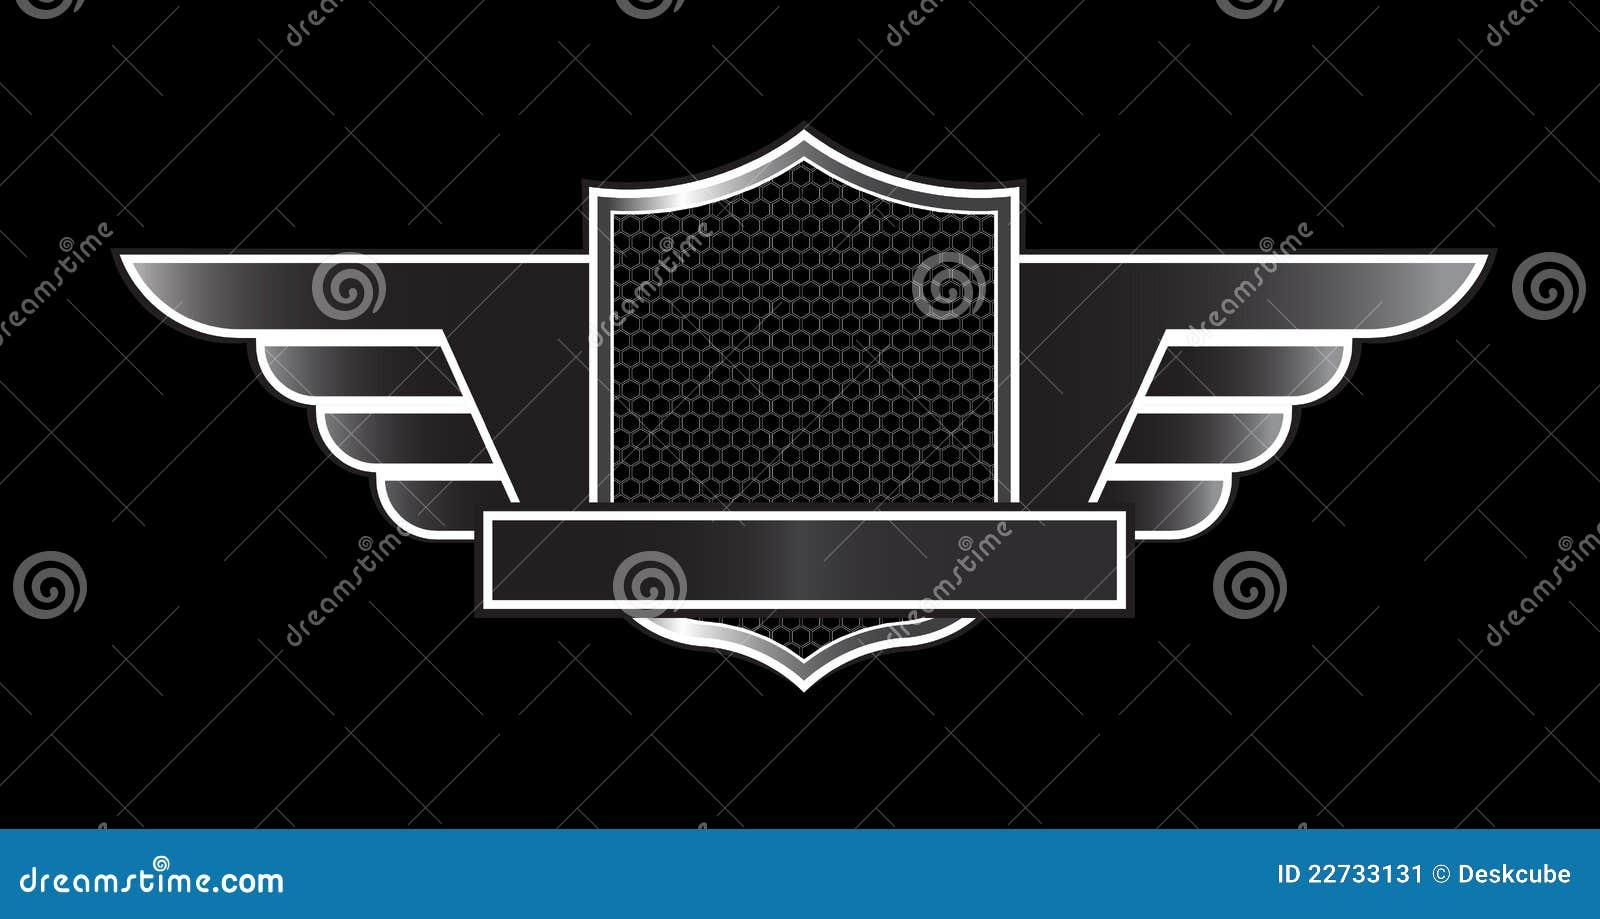 Luxury Black Emblem Stock Vector Illustration Of Grid 22733131